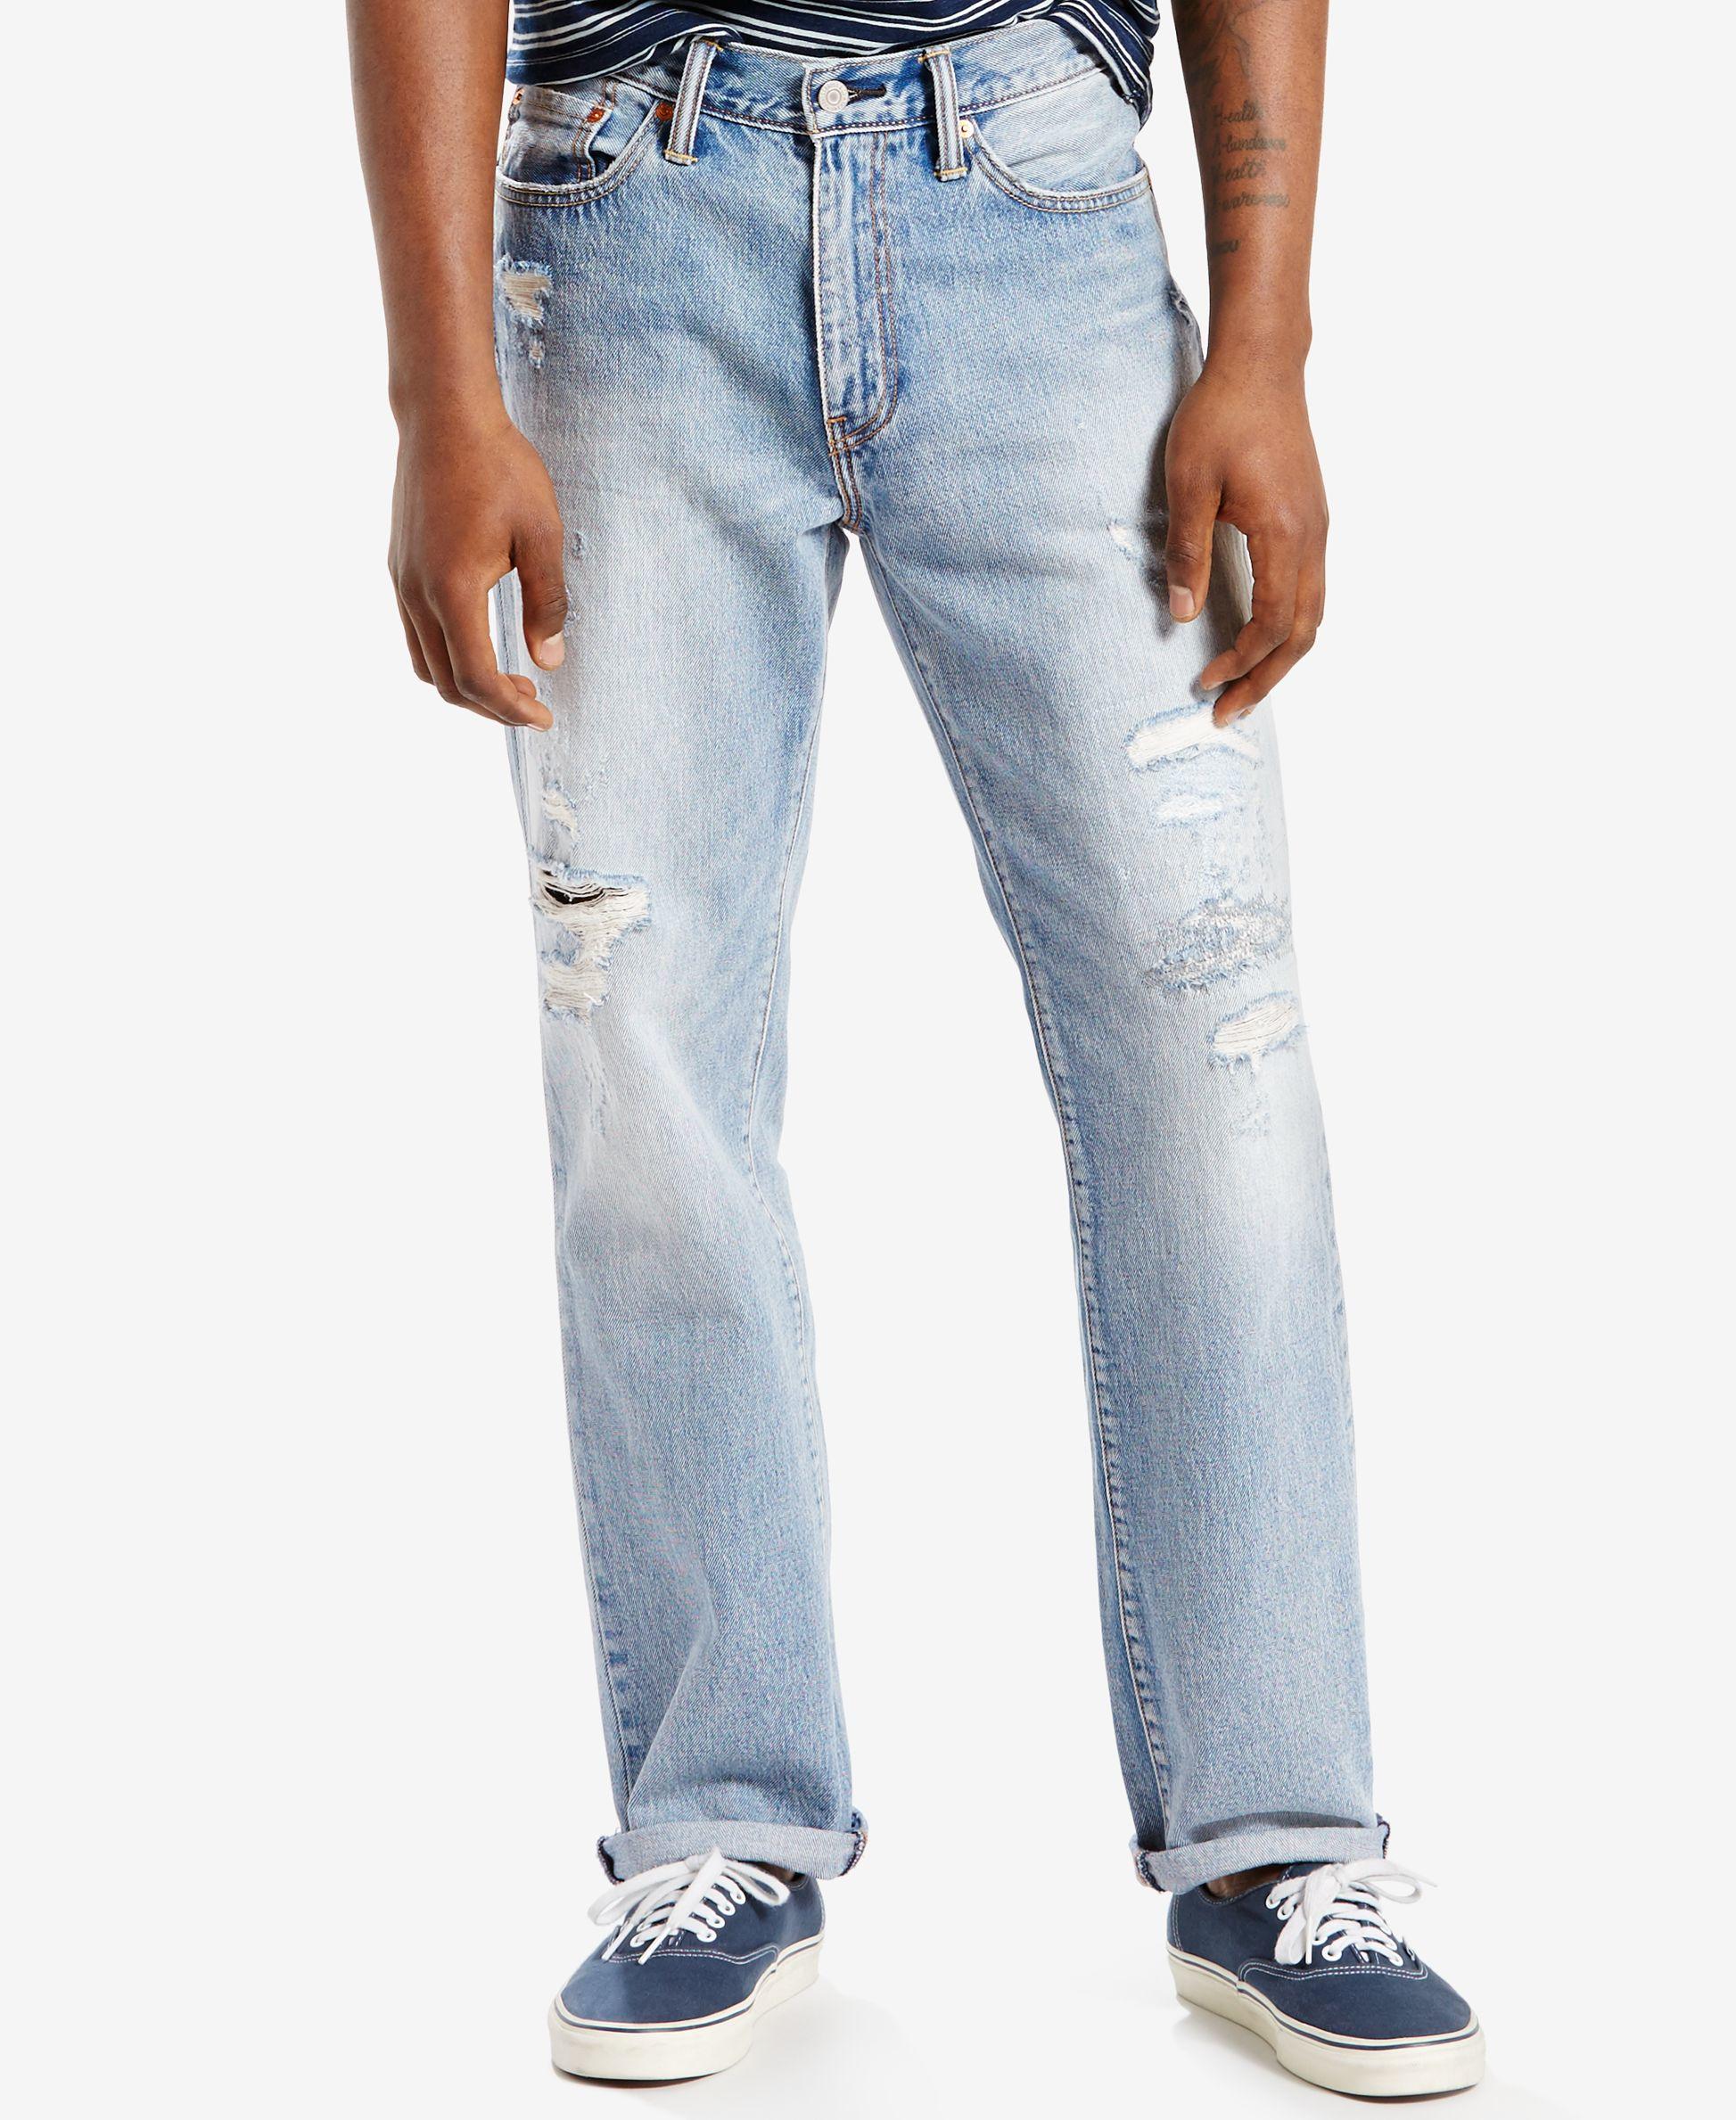 Macys Womens Levi Jeans